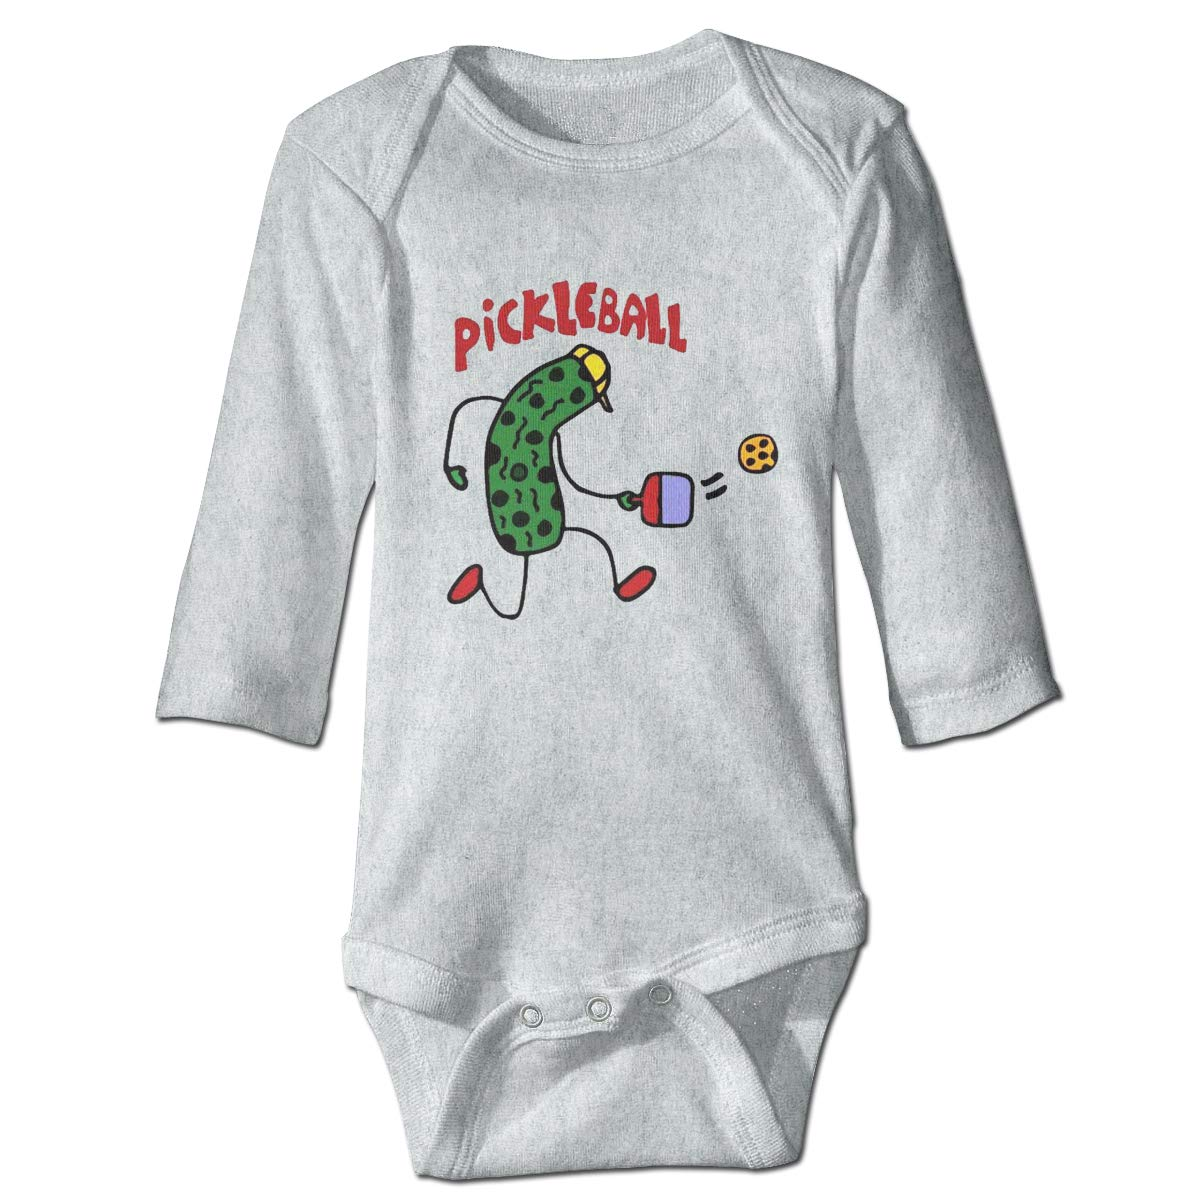 Olyha Baby Long Sleeve Pickle Playing Pickleball Onesies Bodysuit Fashion Romper Creeper